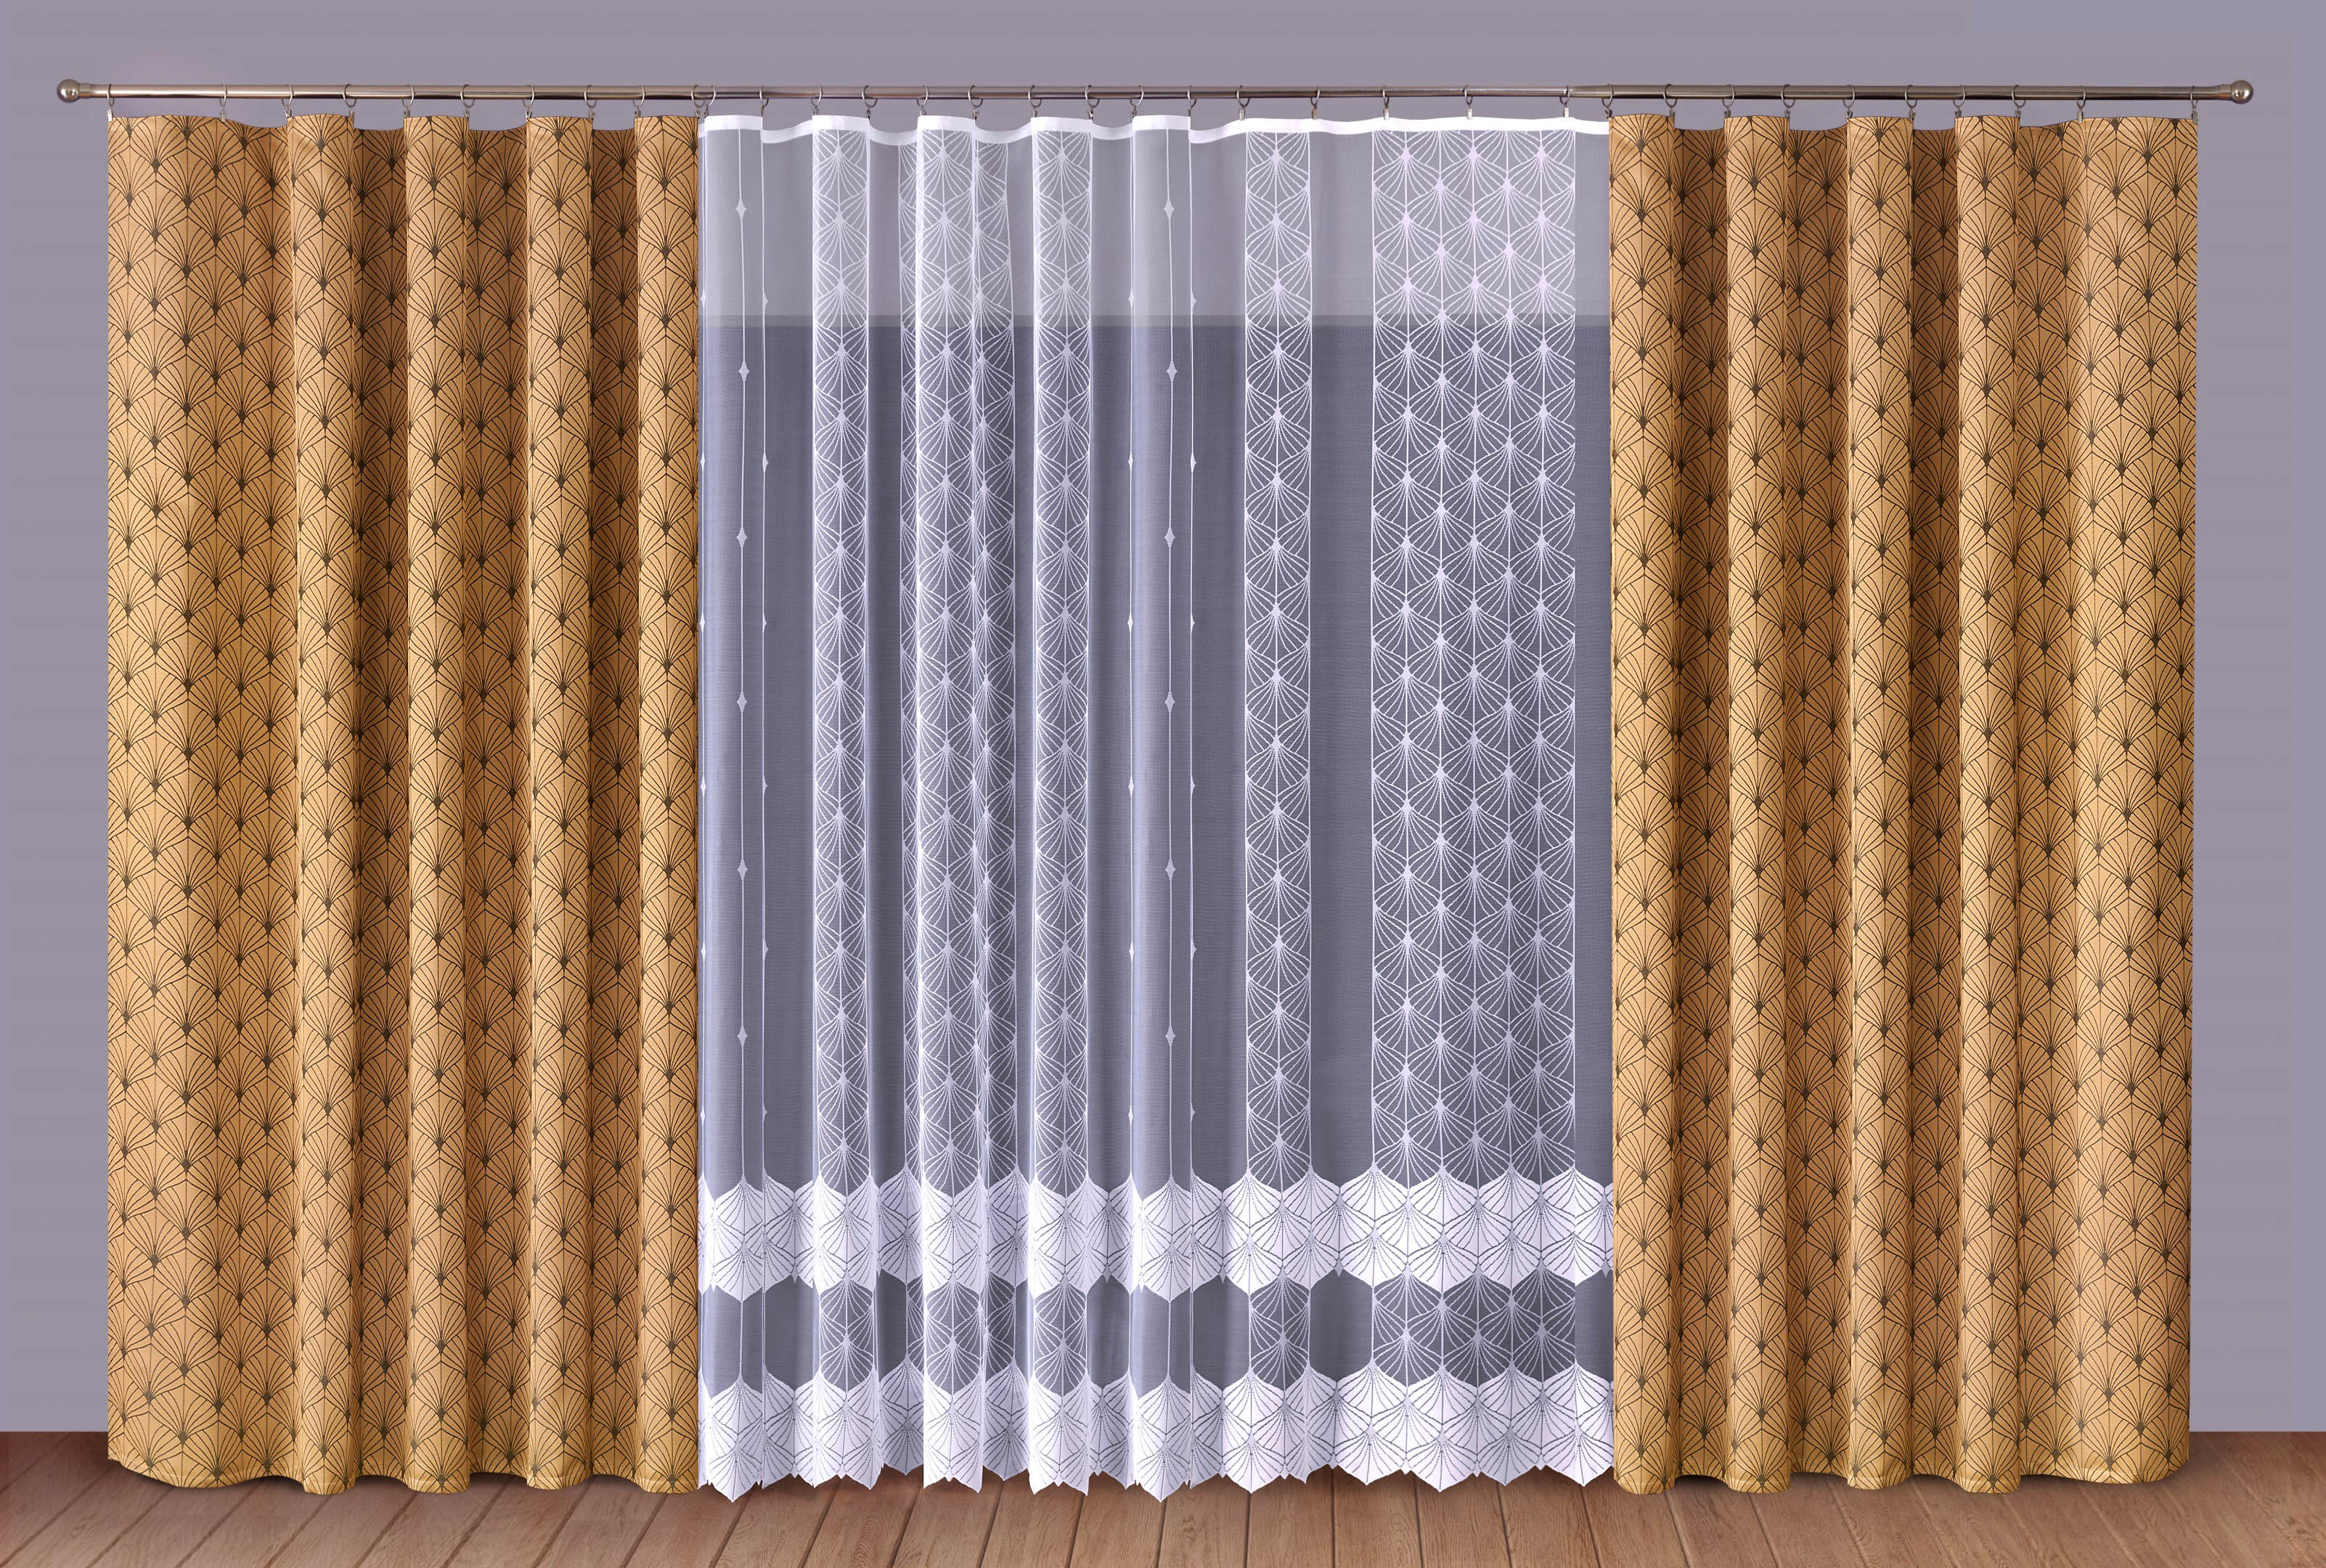 Шторы Primavera Классические шторы Albertine Цвет: Коричневый-Белый шторы kauffort классические шторы primavera st цвет оранжевый